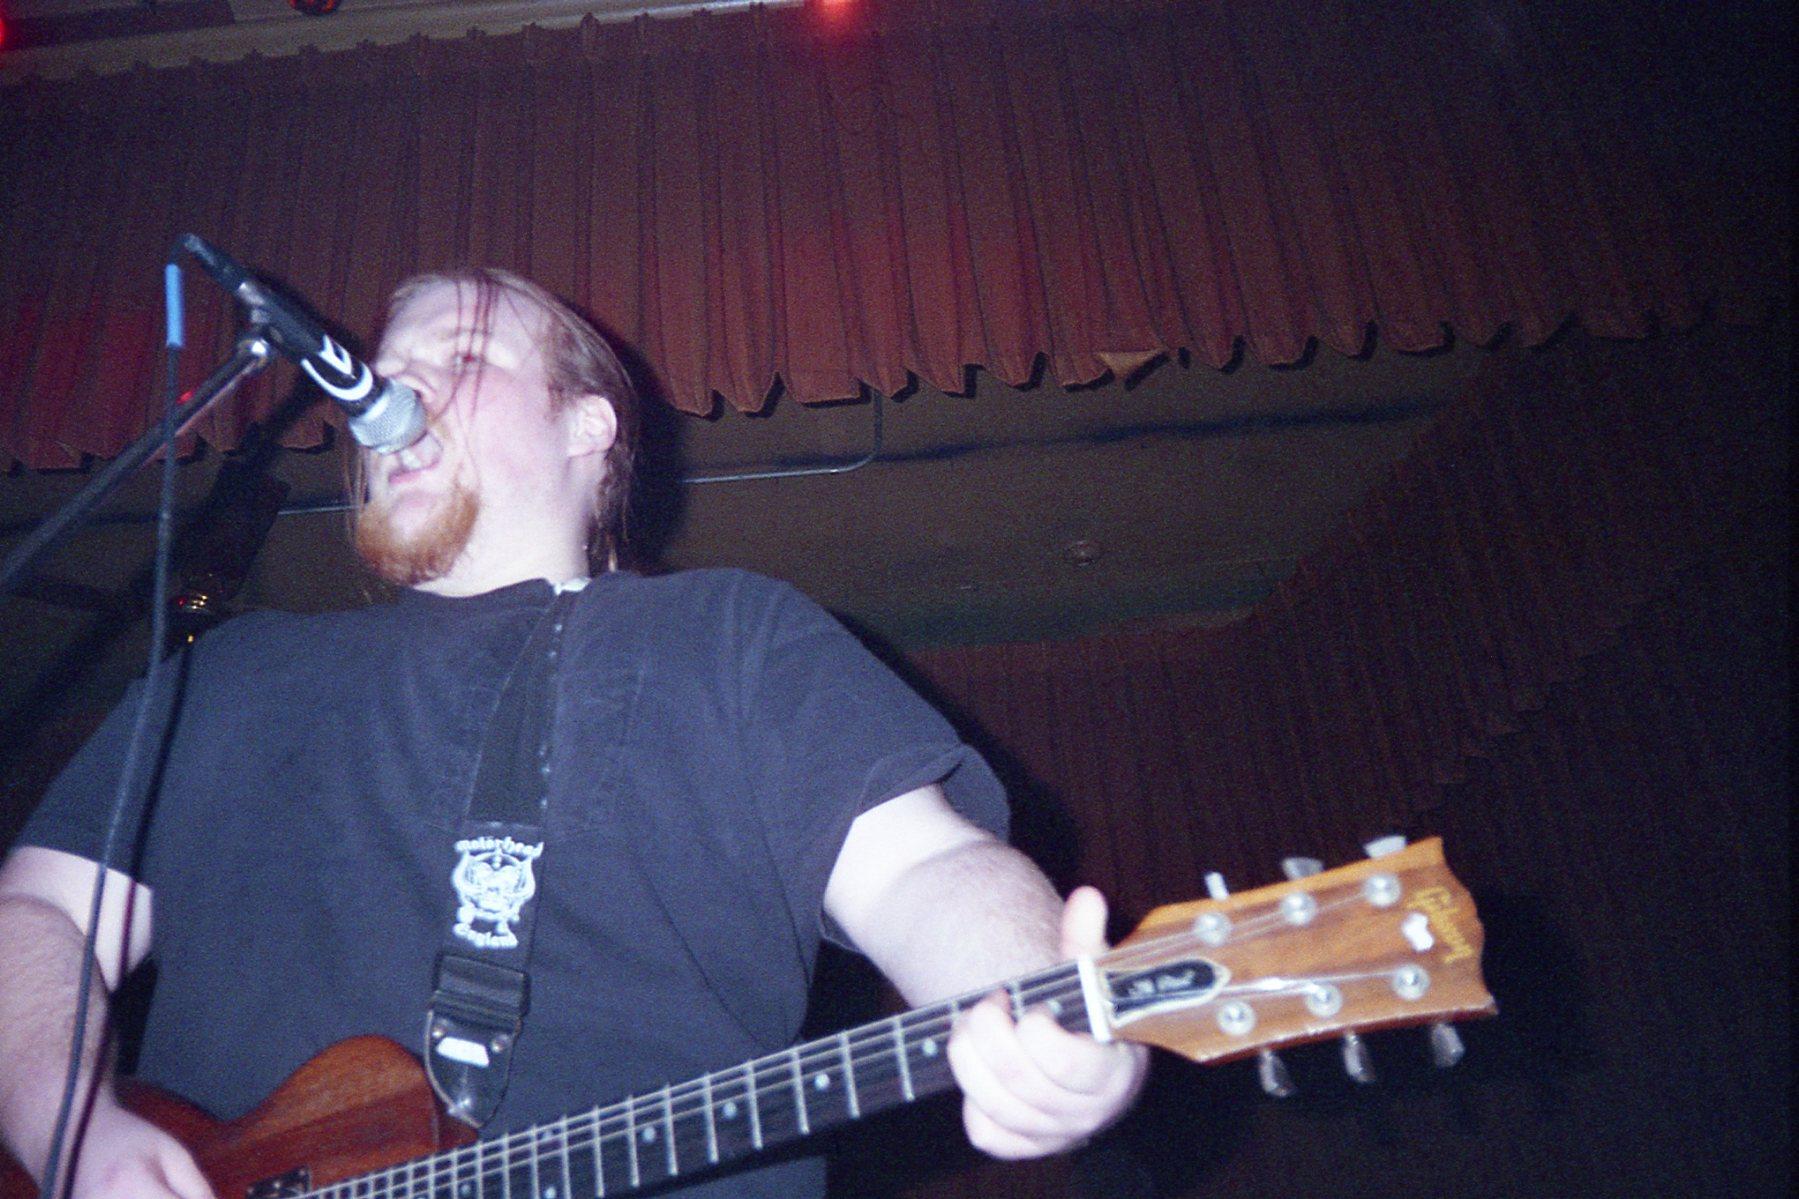 photo – Evan @ Fleetwood 1996